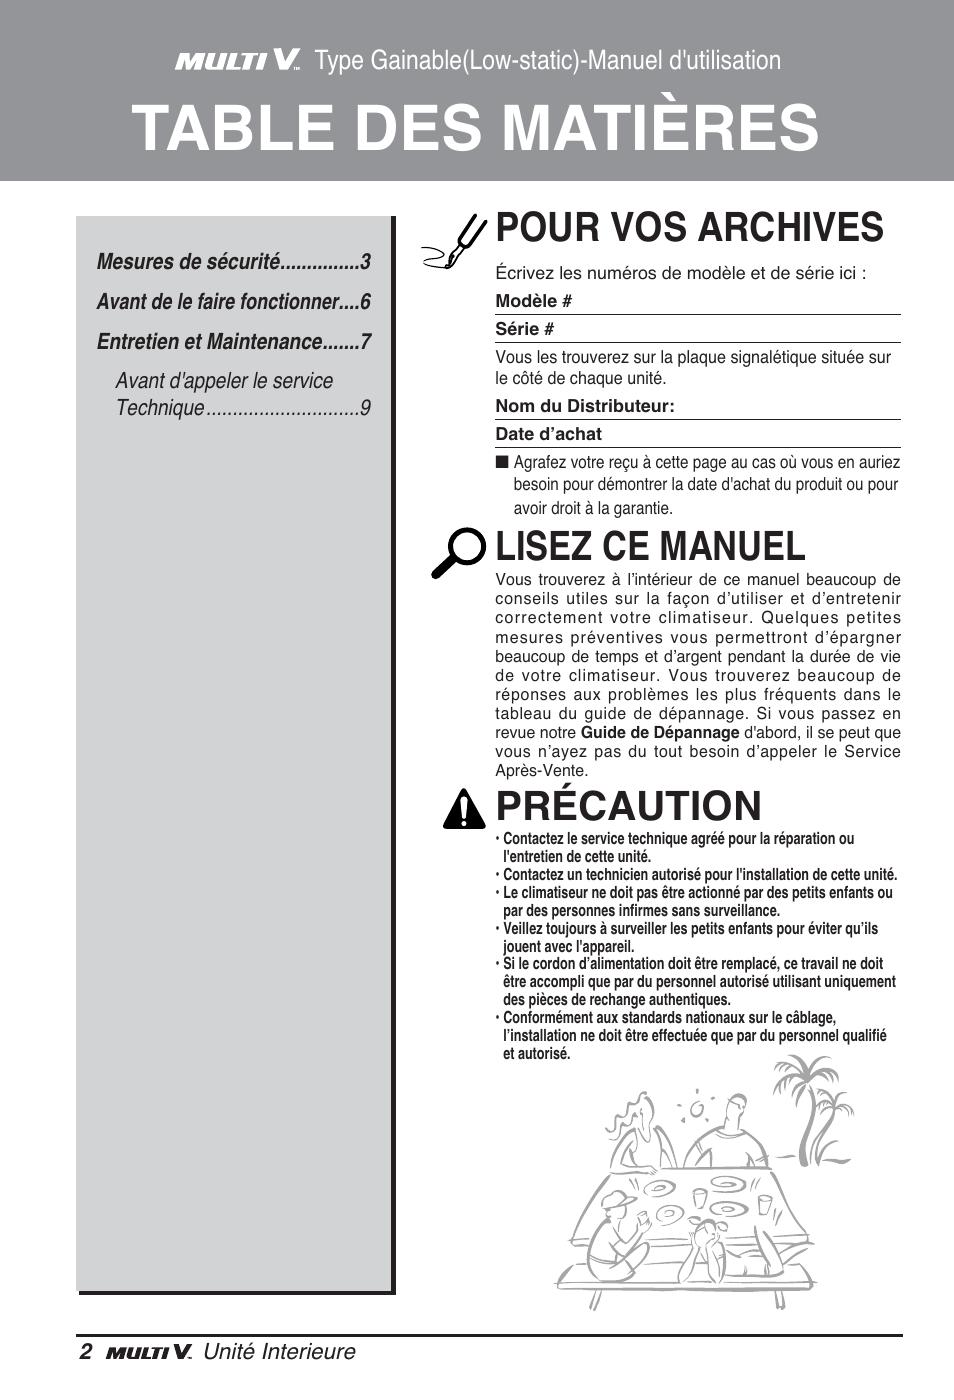 LG ARNU12GL2G2 User Manual | Page 32 / 91 | Original mode | Also for